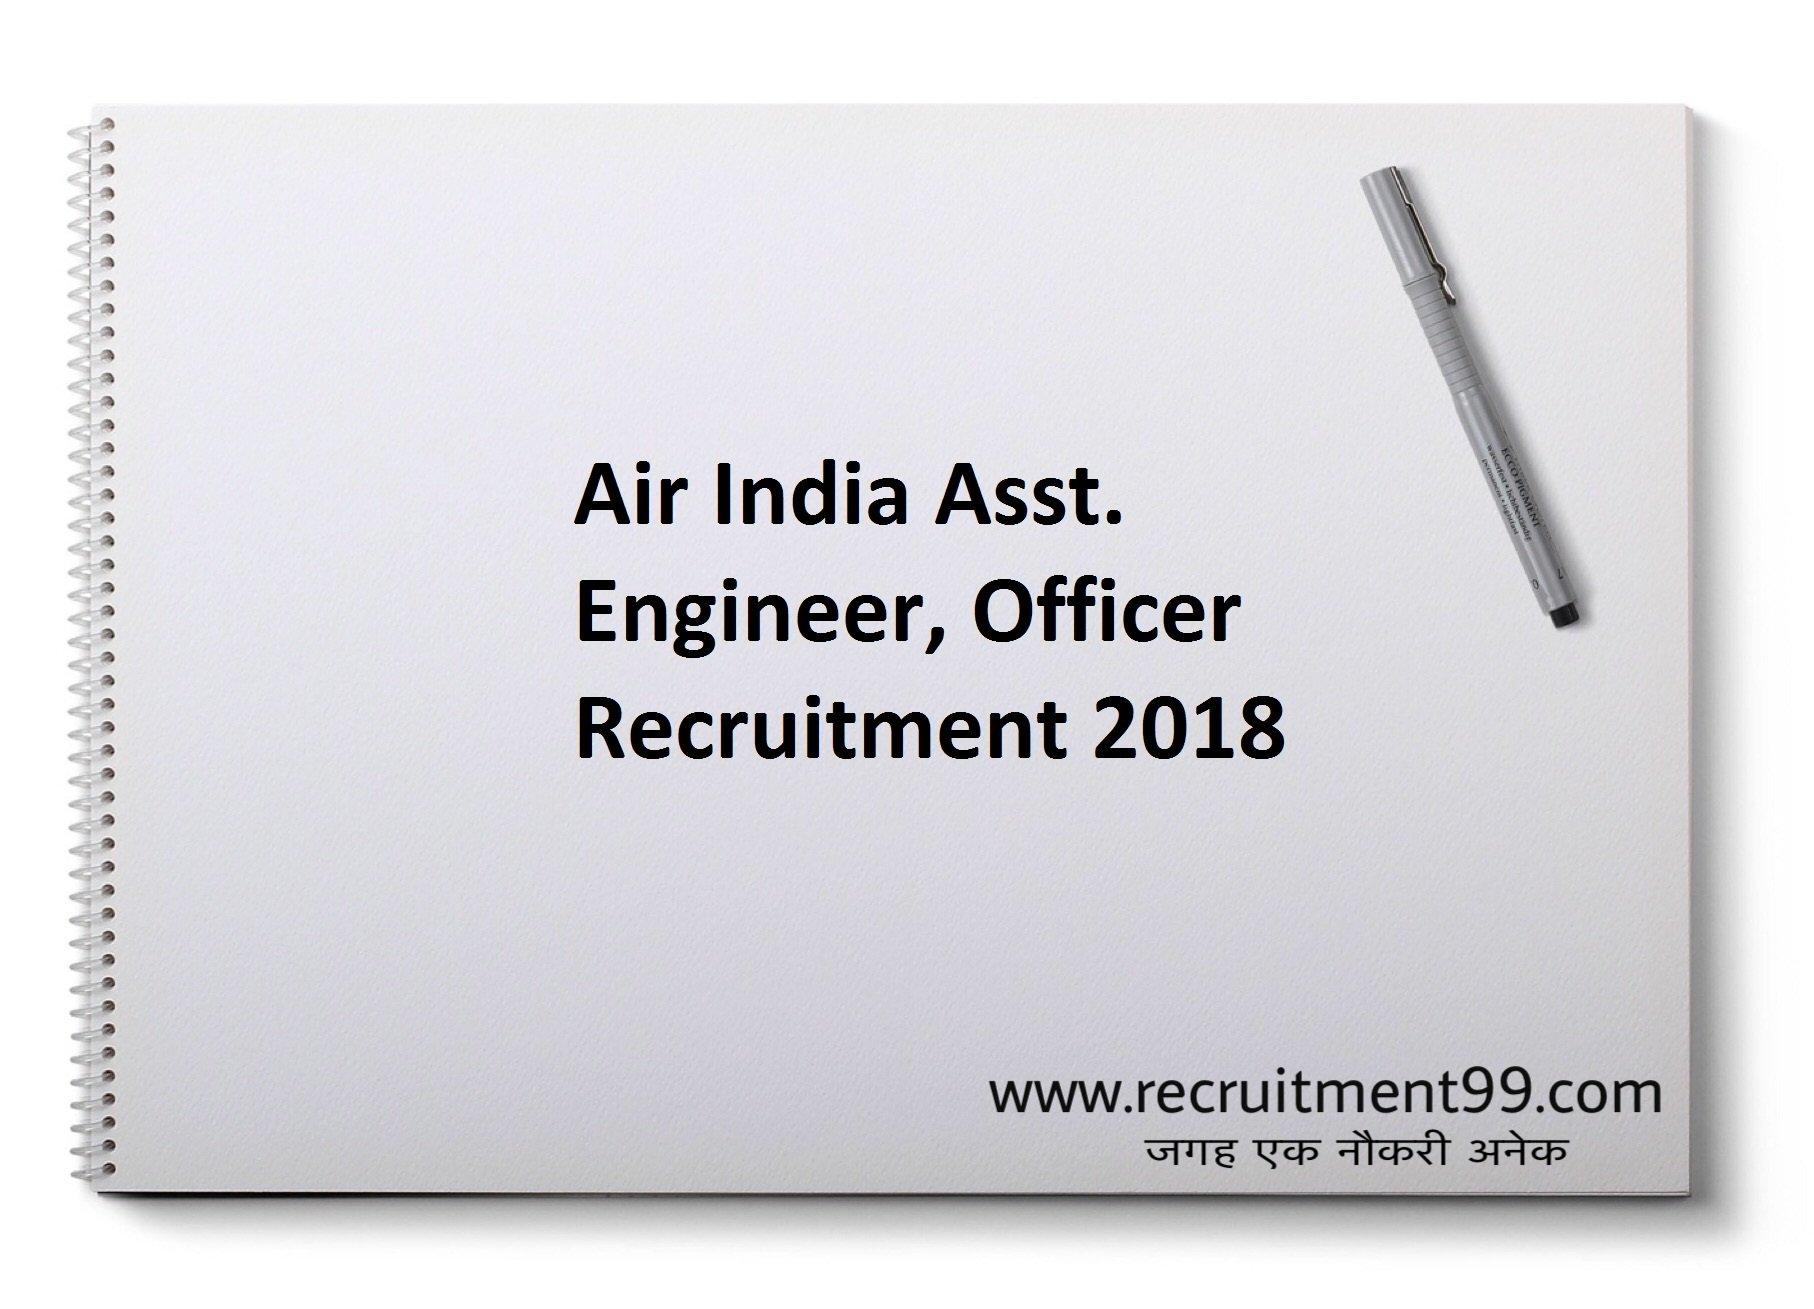 Air India Asst. Engineer Officer Recruitment Admit Card Result 2018